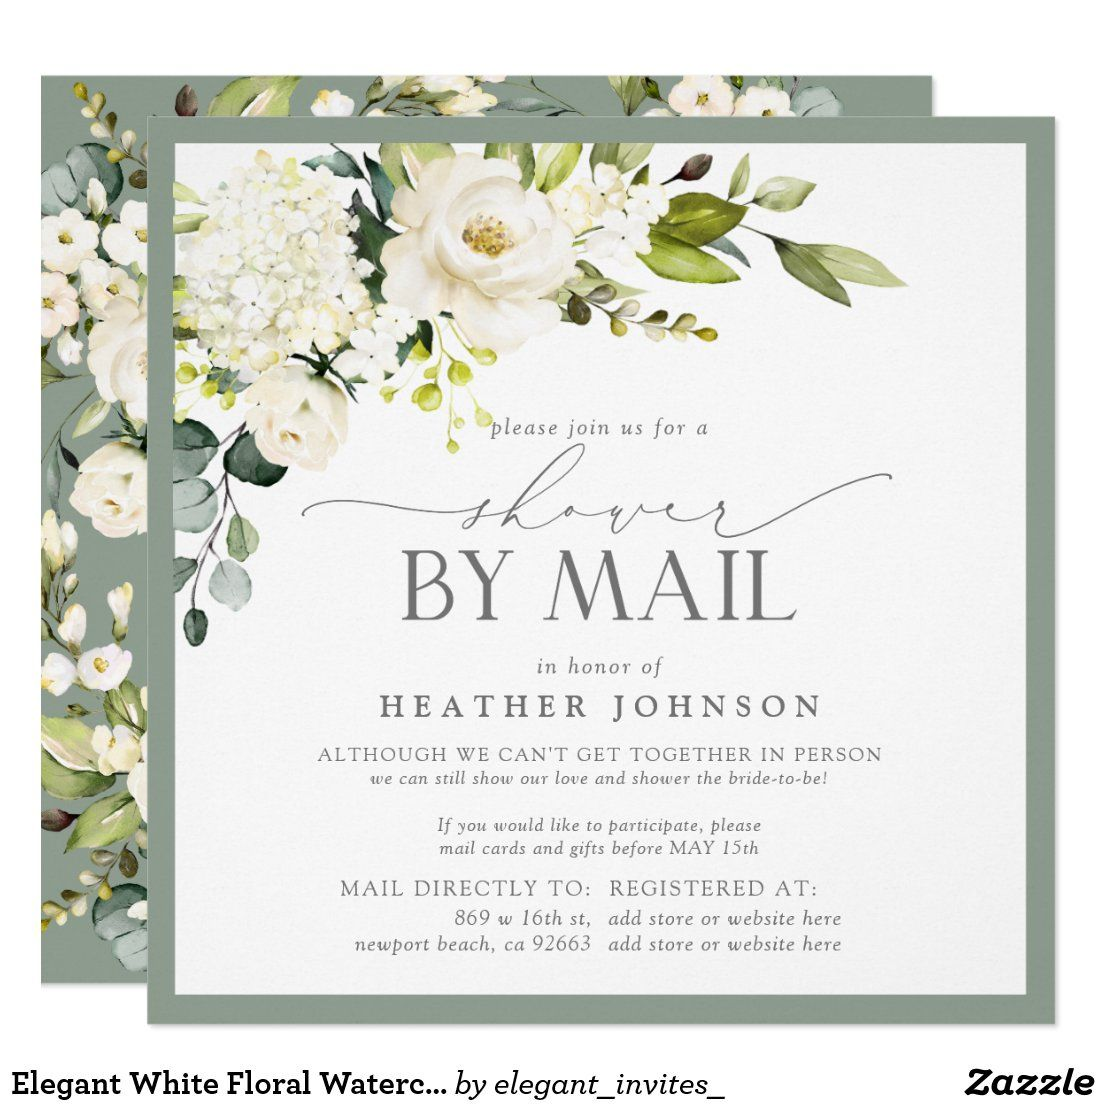 Elegant White Floral Watercolor Bridal Shower Mail